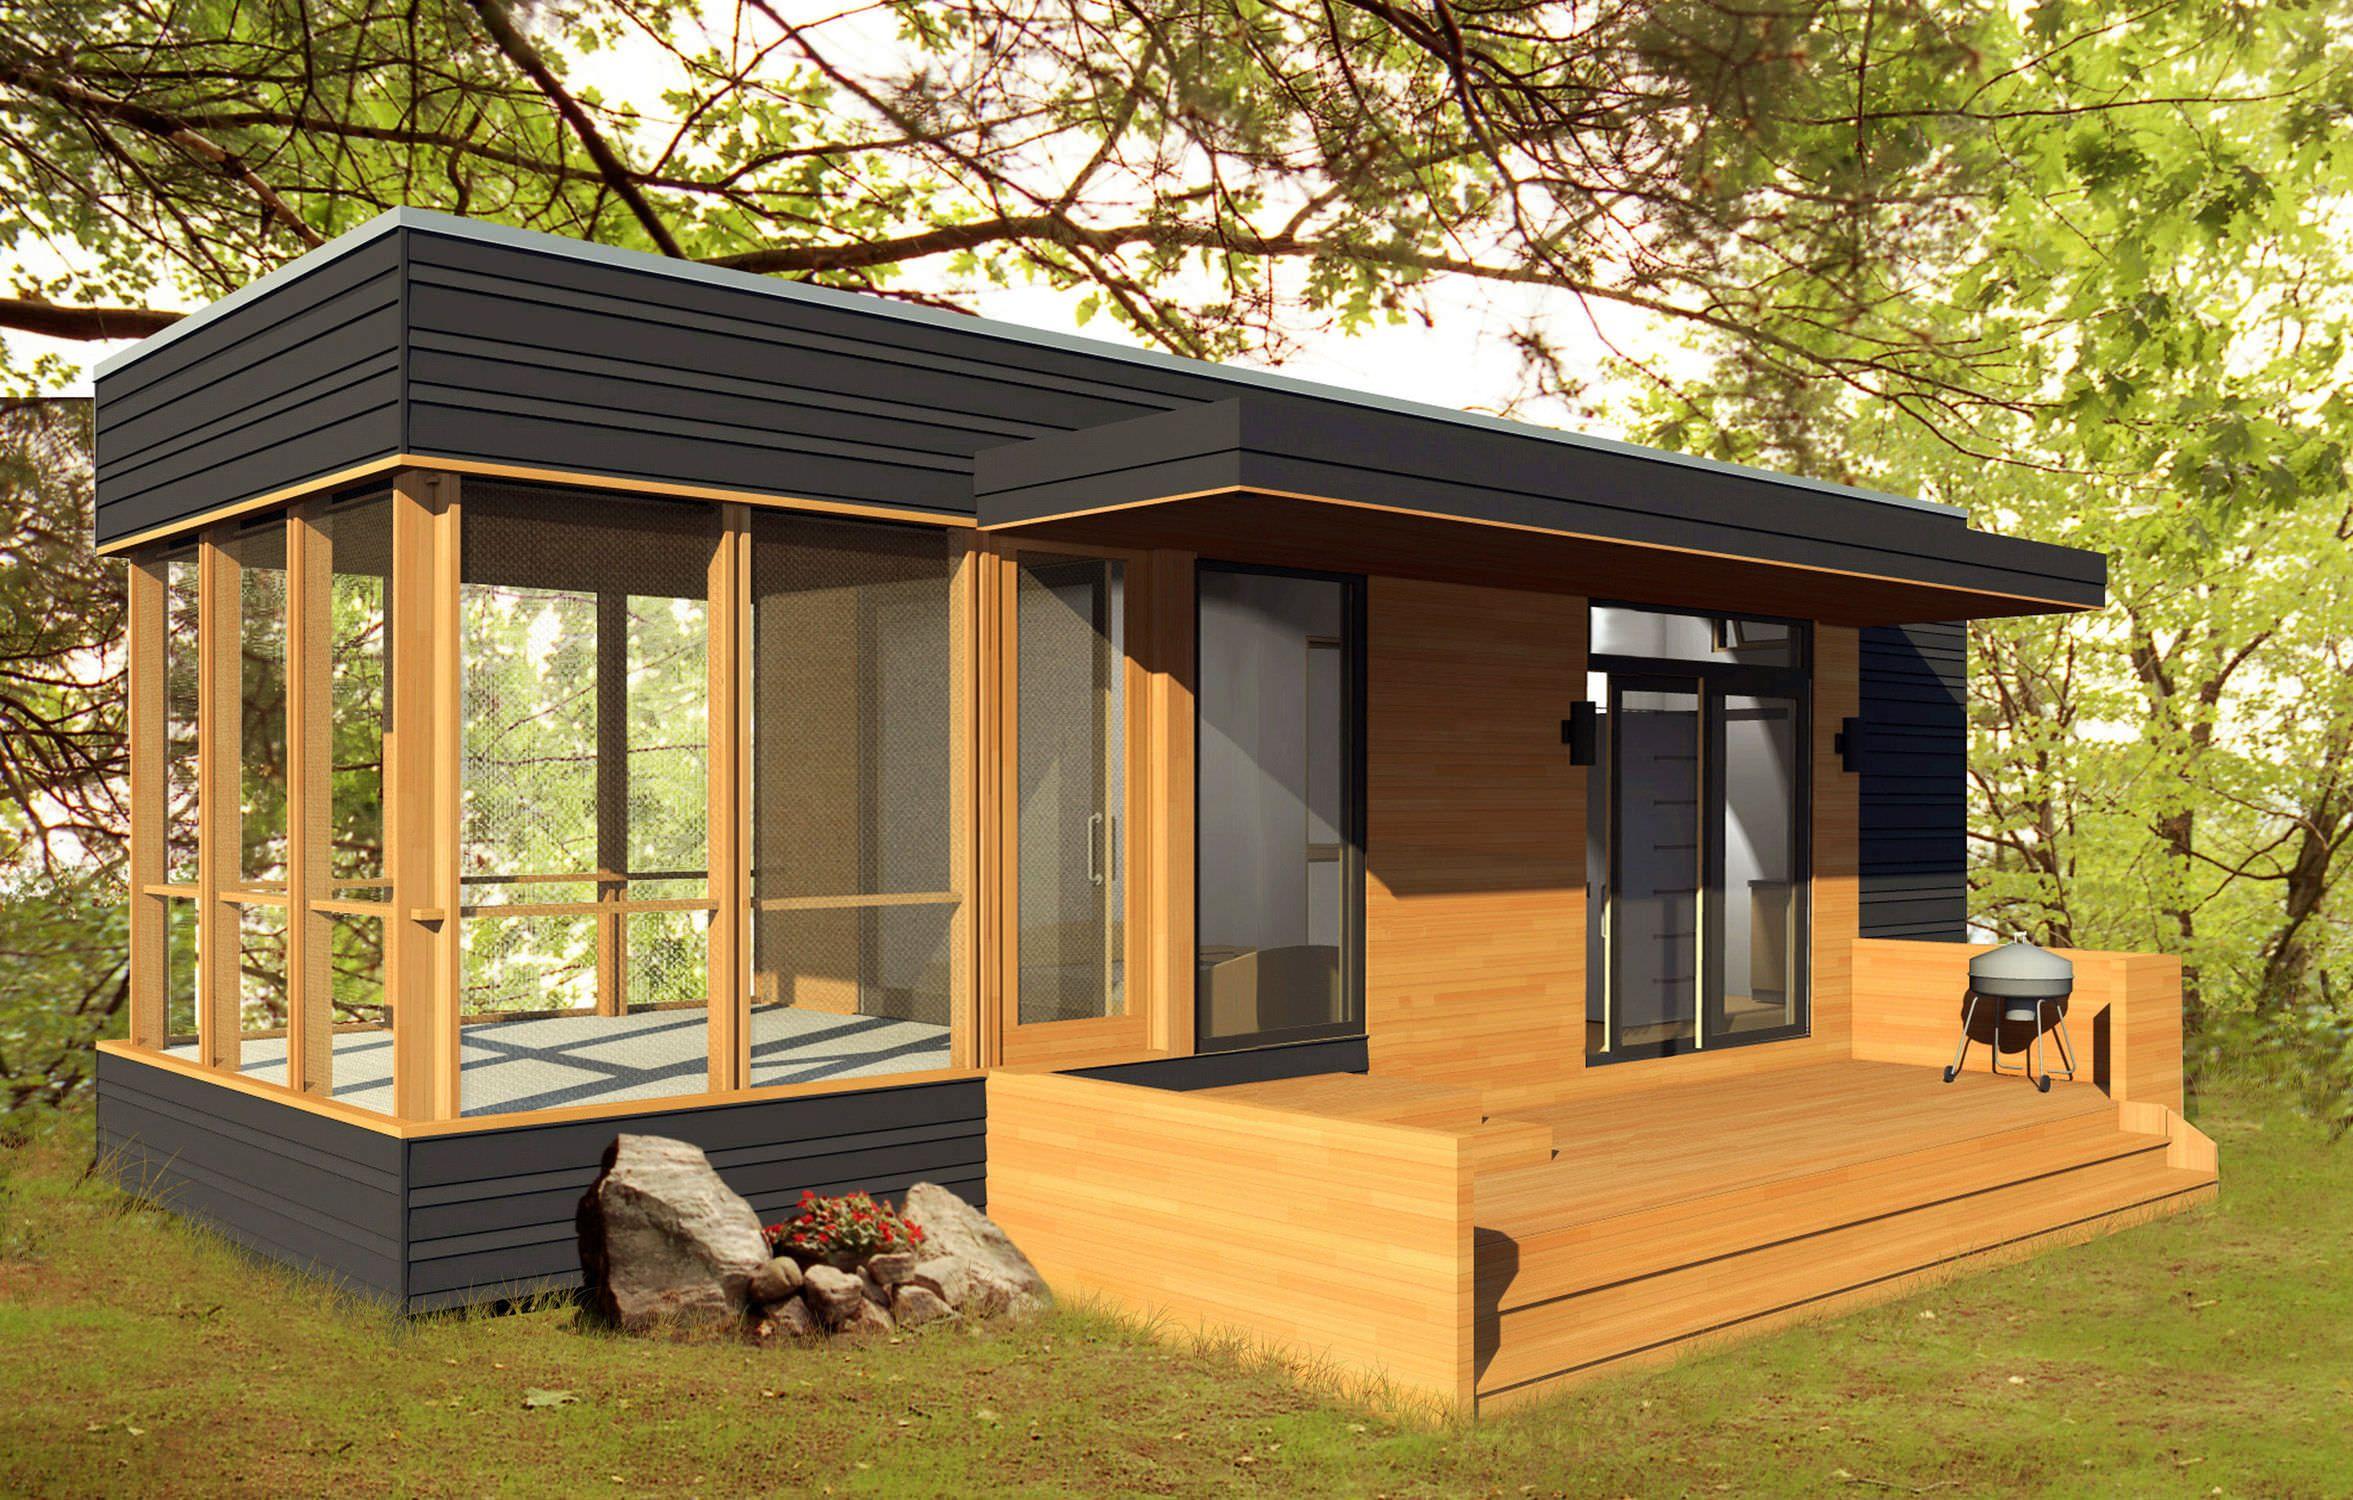 Curtis Emmet Micro Home Designs HomeStyle Digest